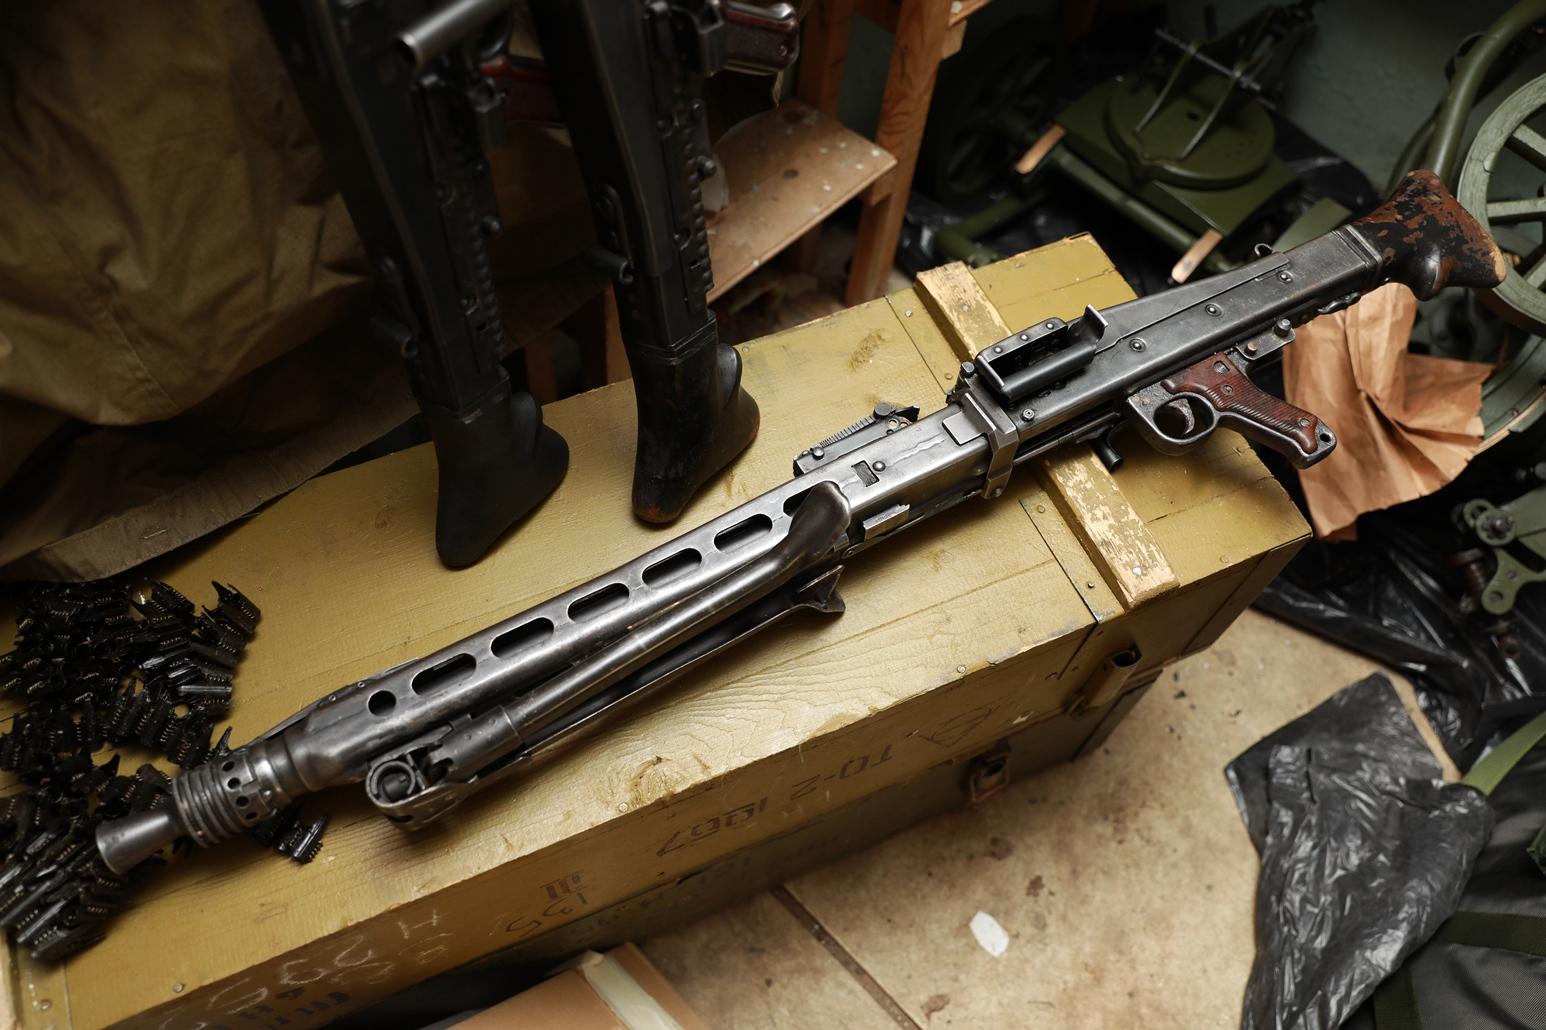 Югославский пулемет М-53 (MG-42) №44478